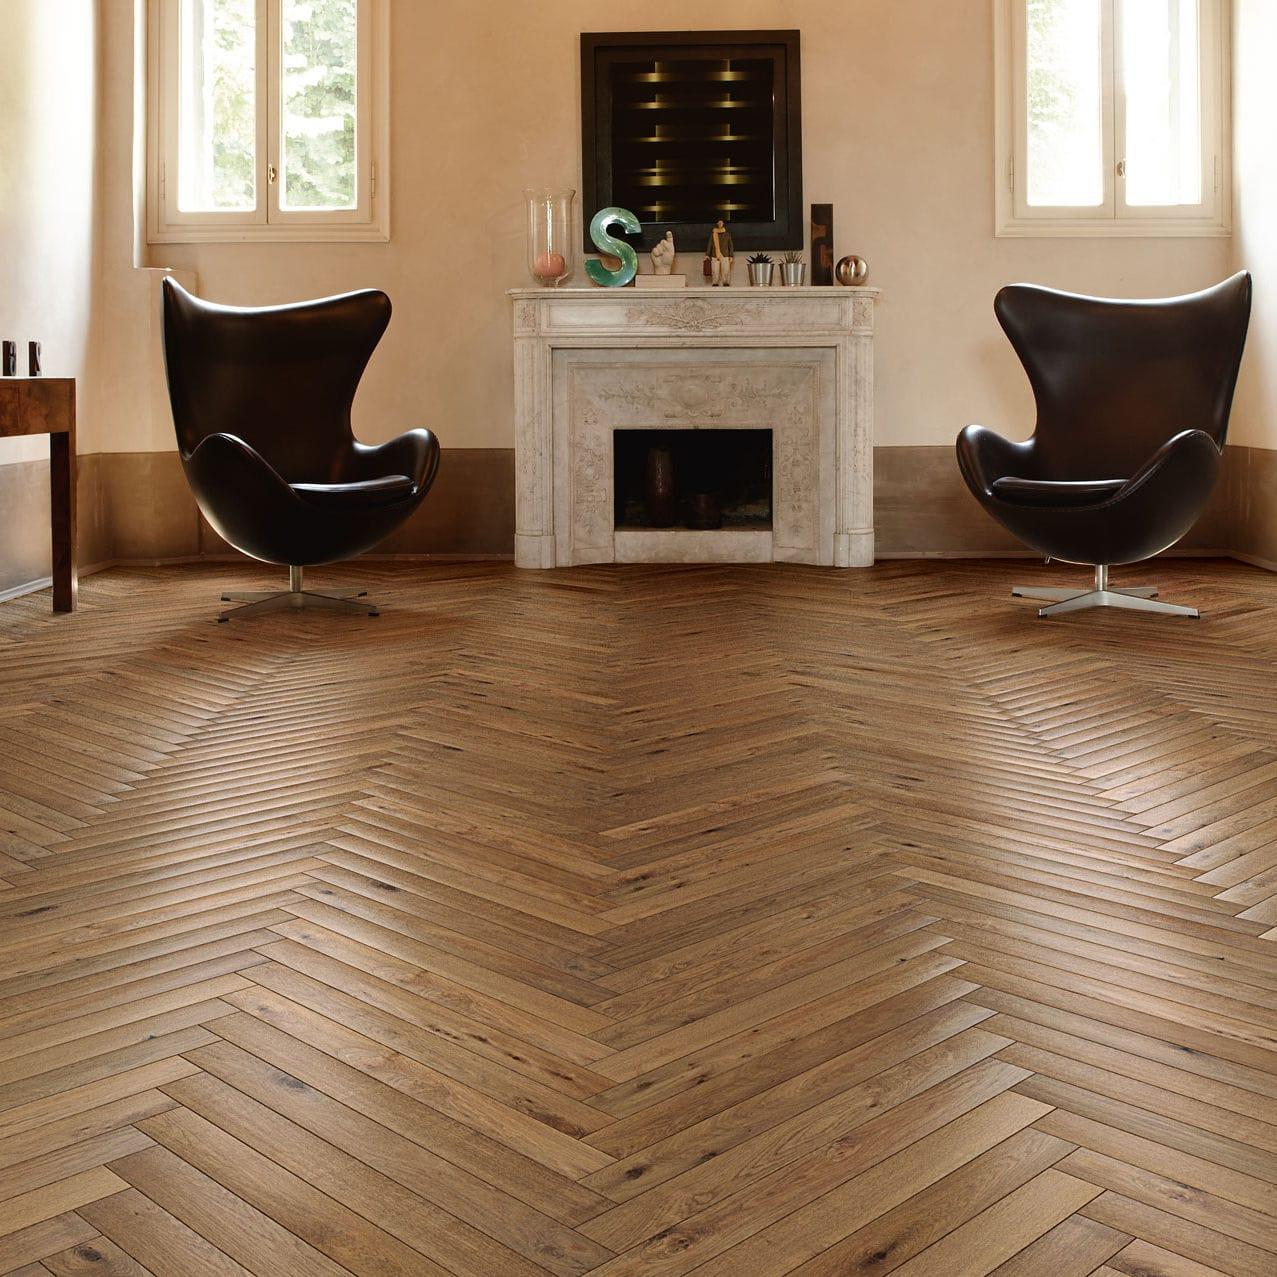 Engineered Parquet Floor Heritage Filigrana Listone Giordano Glued Oak Birch